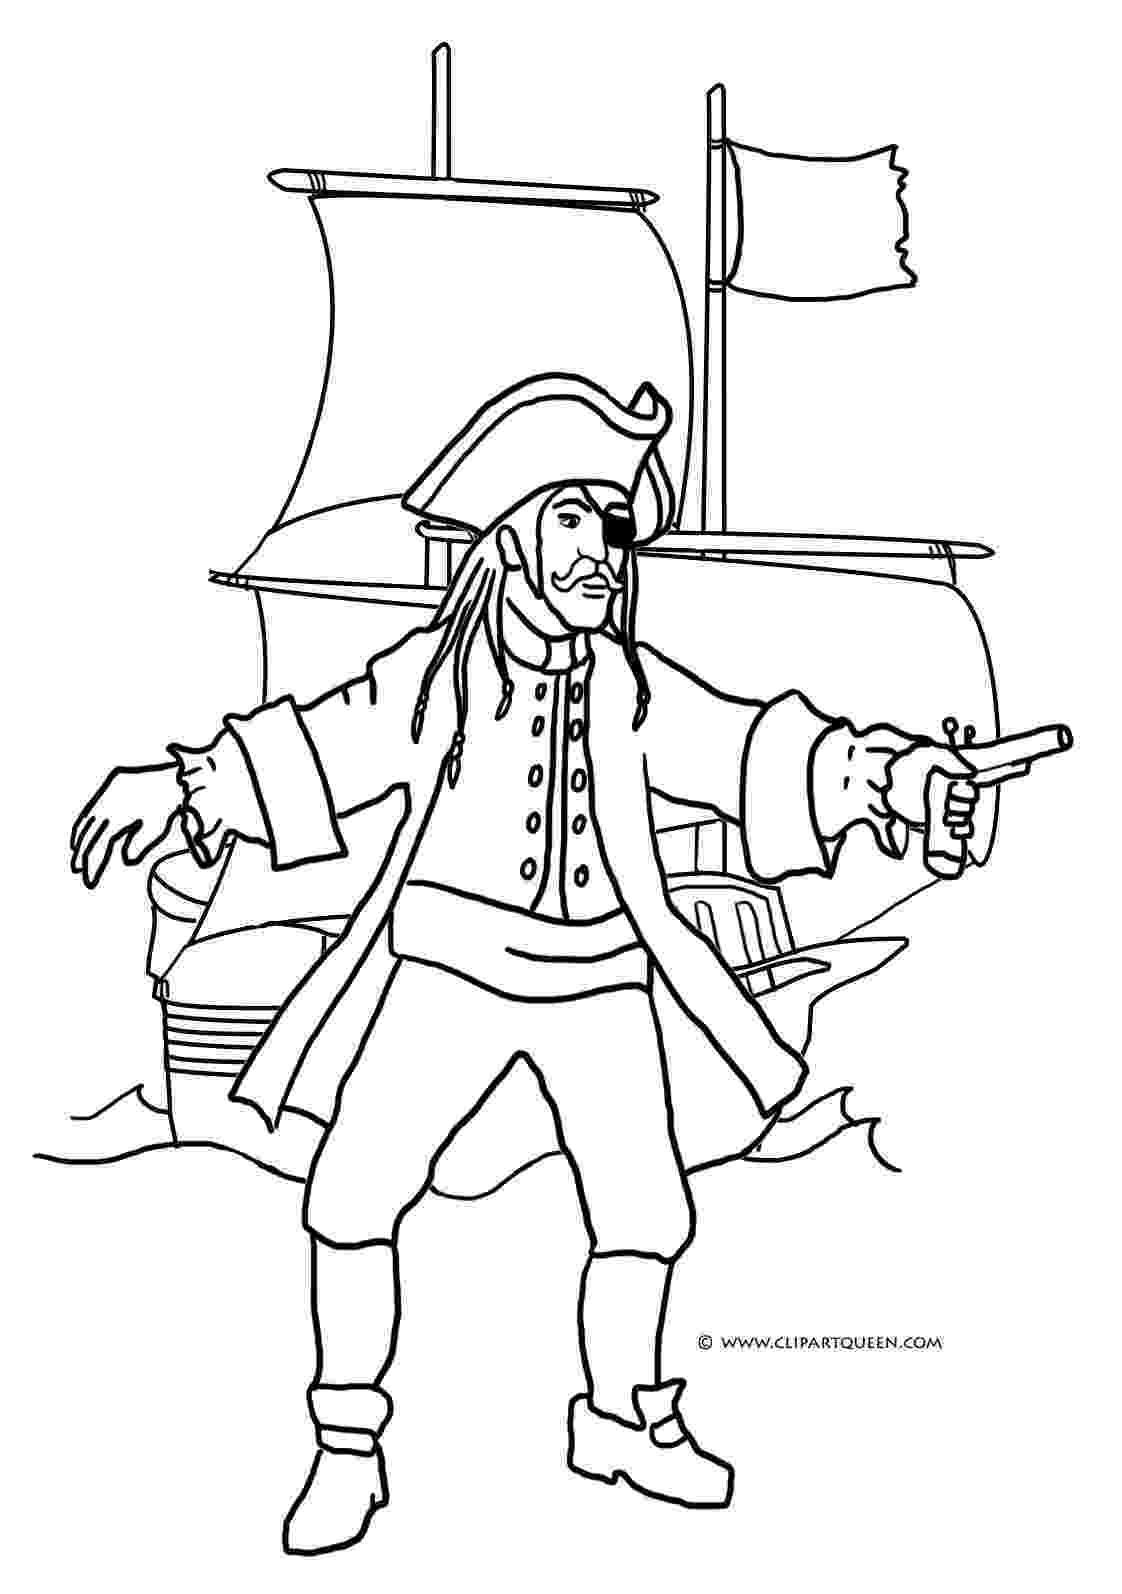 pirates coloring pages pirates coloring pages learn to coloring coloring pages pirates